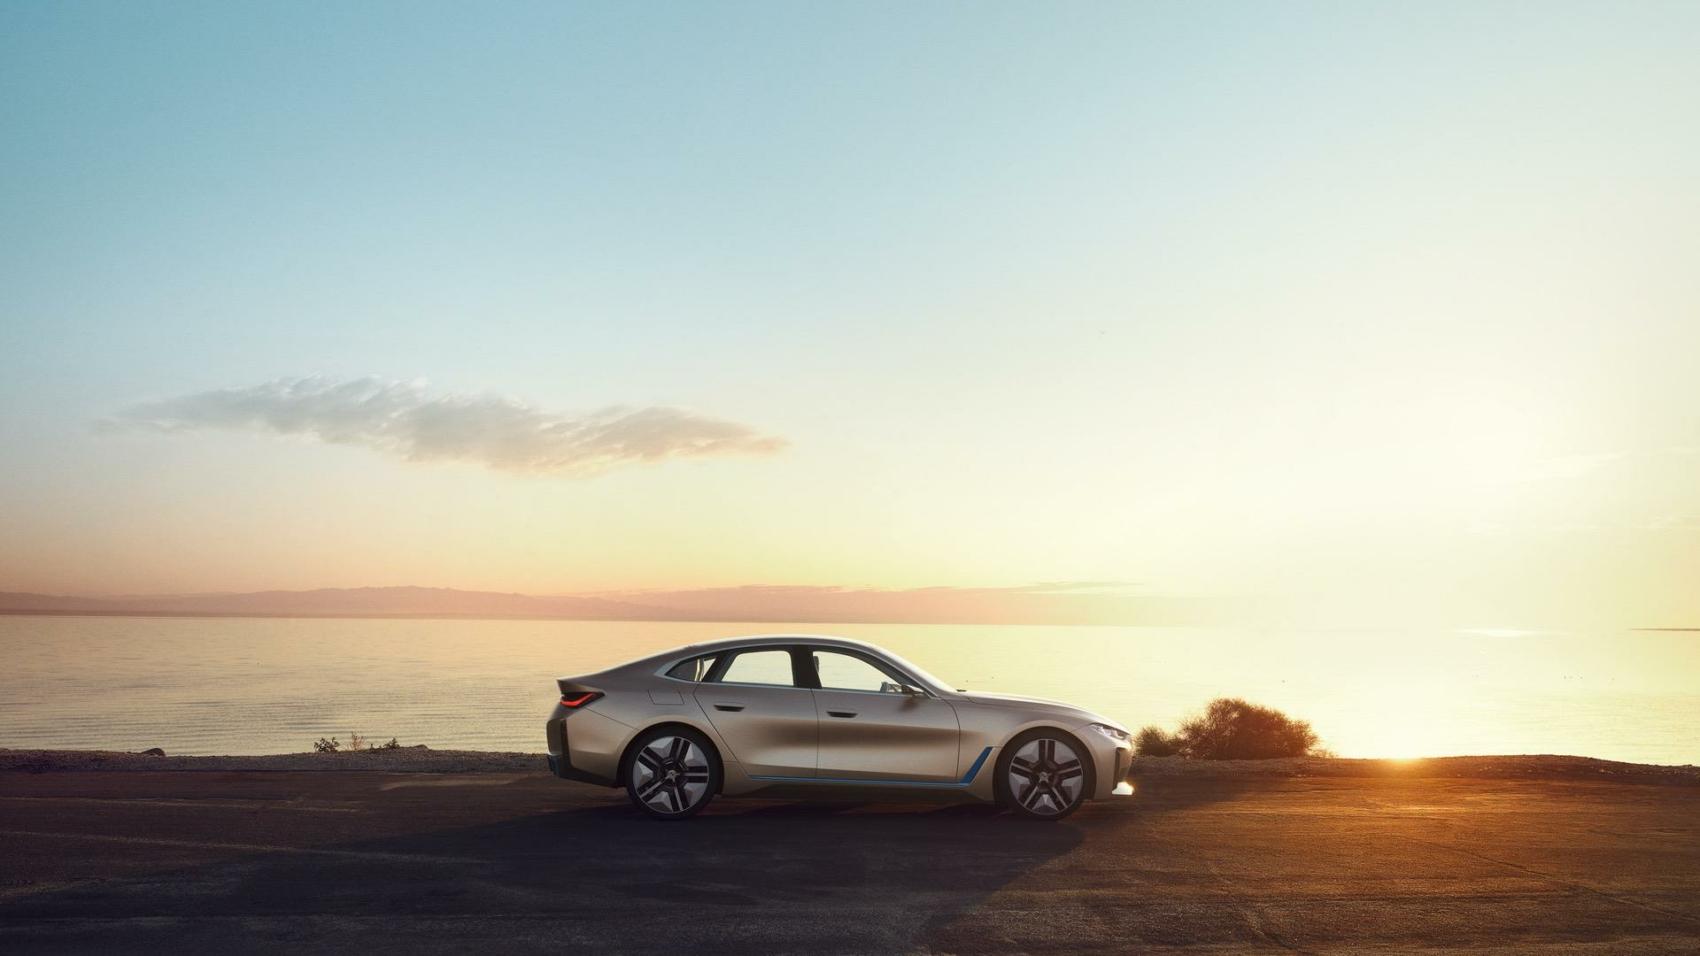 BMW-Concept-i4-images-00